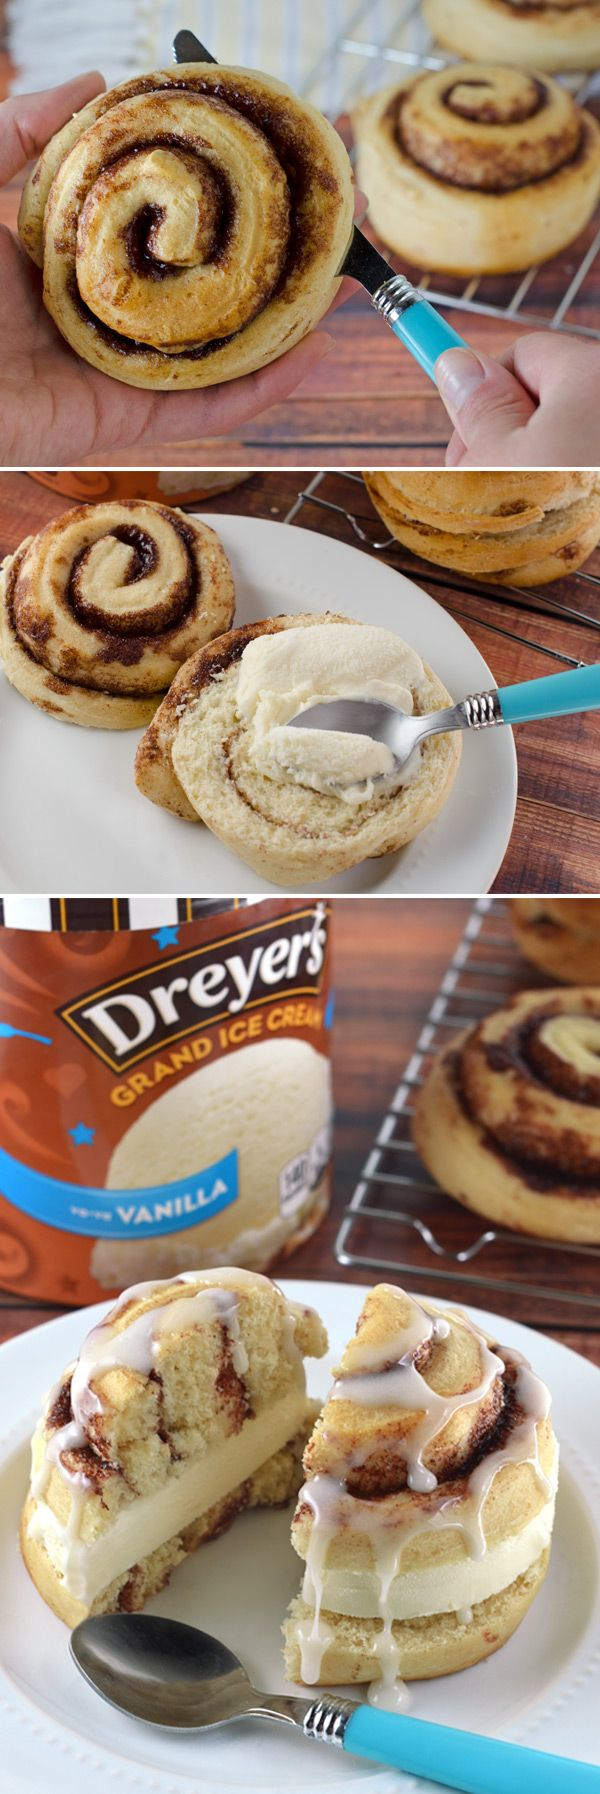 Dreyer's Cinnamon Roll Ice Cream Pie: This morning's breakfast treat is even better as tonight's cinnamony-sweet shareable dessert!